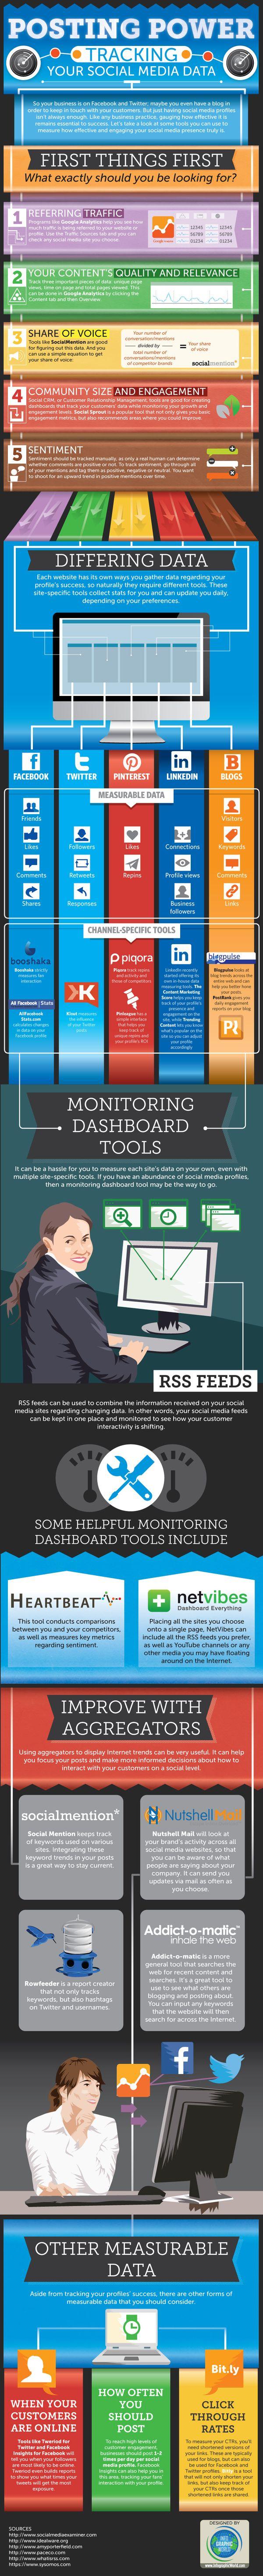 Tracking-social-media-data